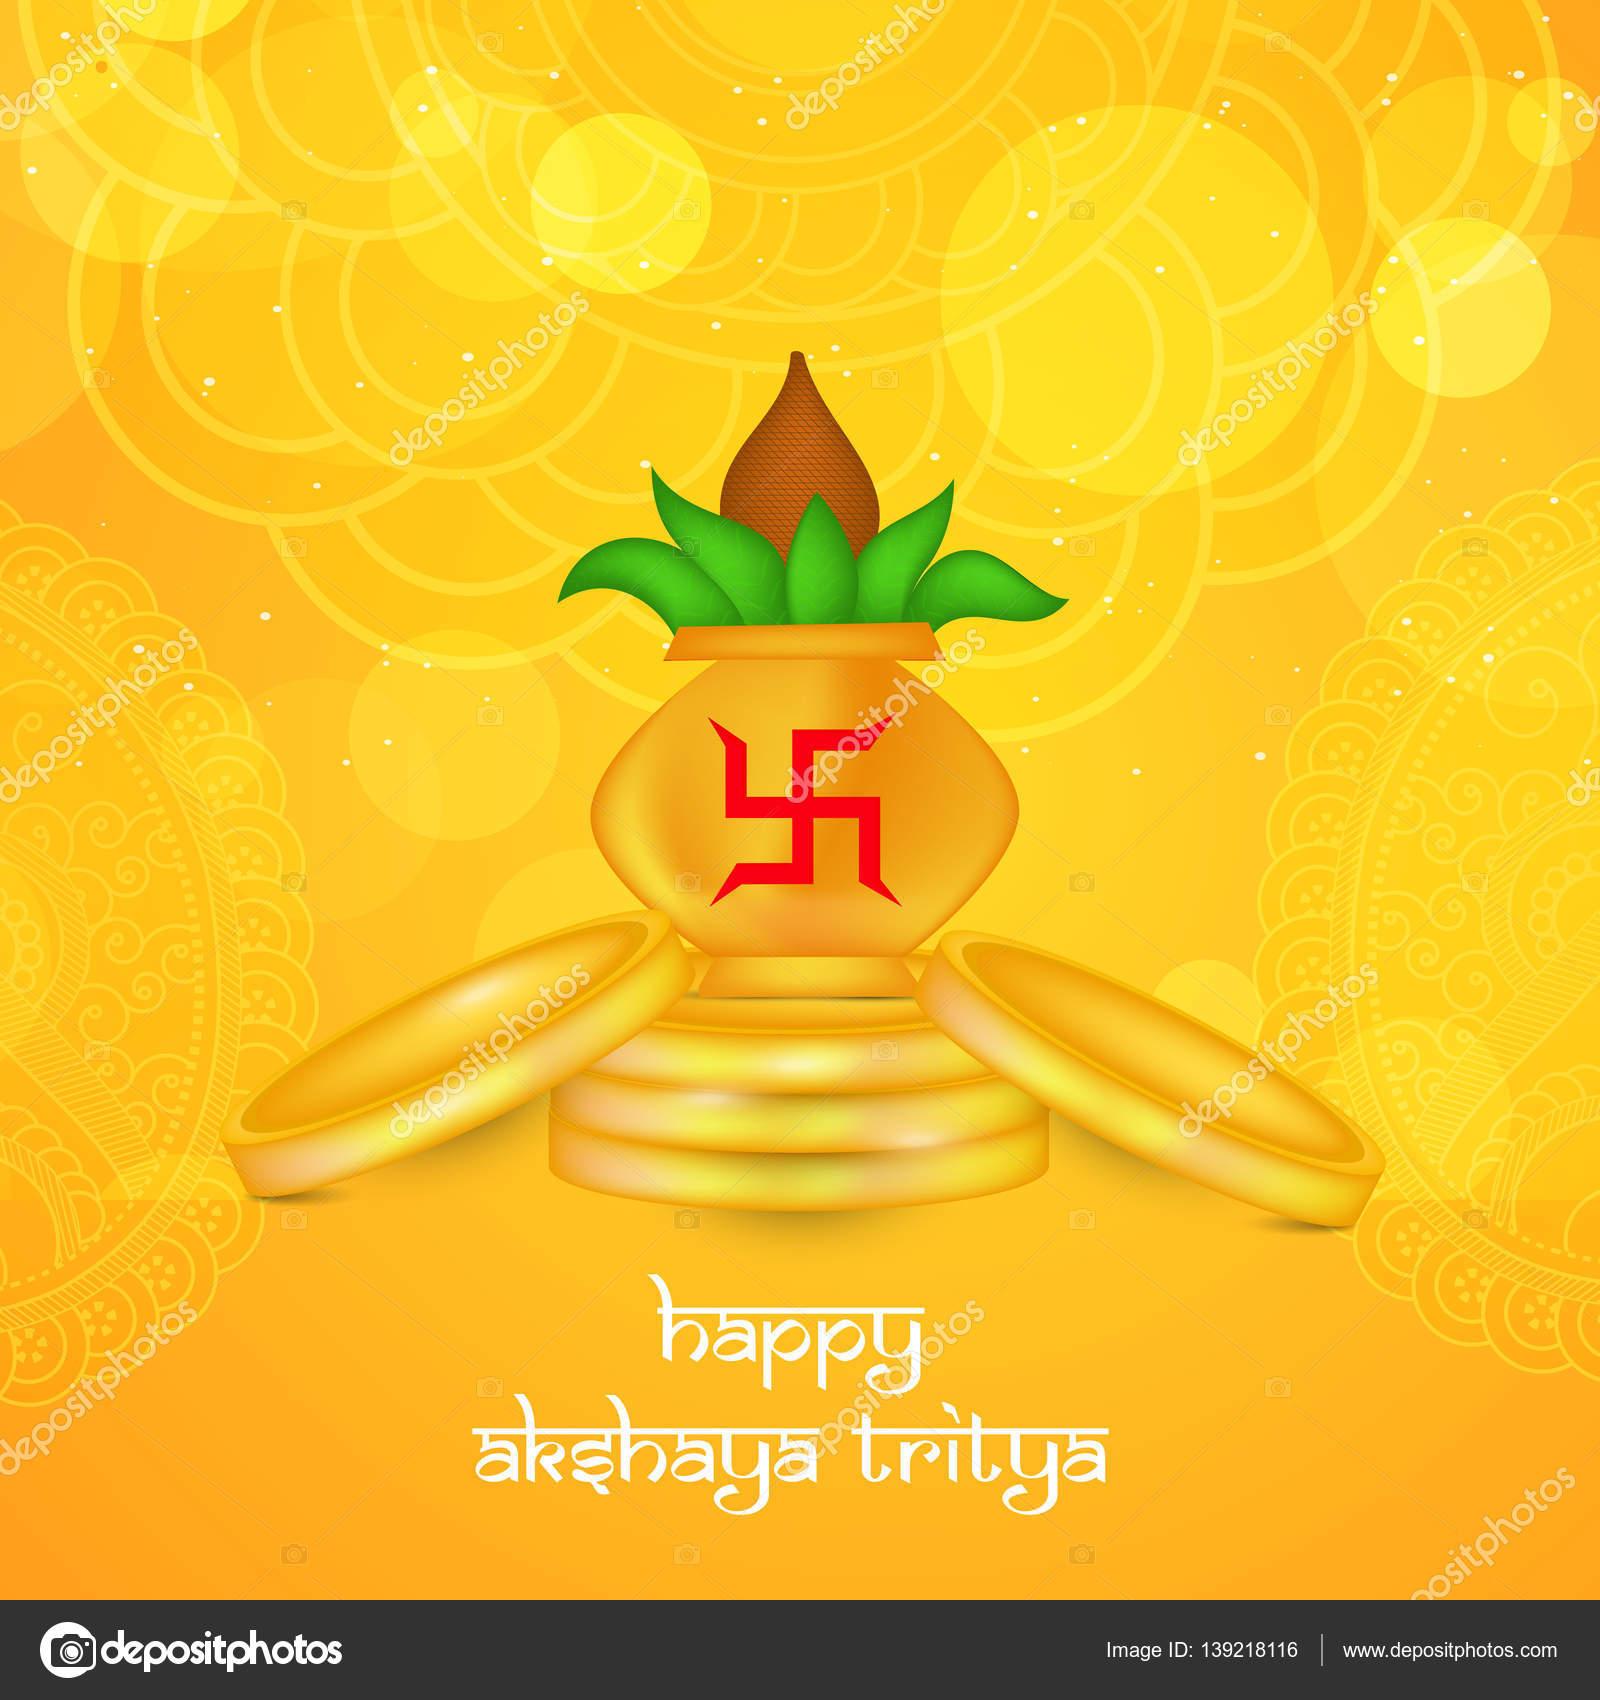 Llustration Of Elements For Akshaya Tritiya Stock Vector